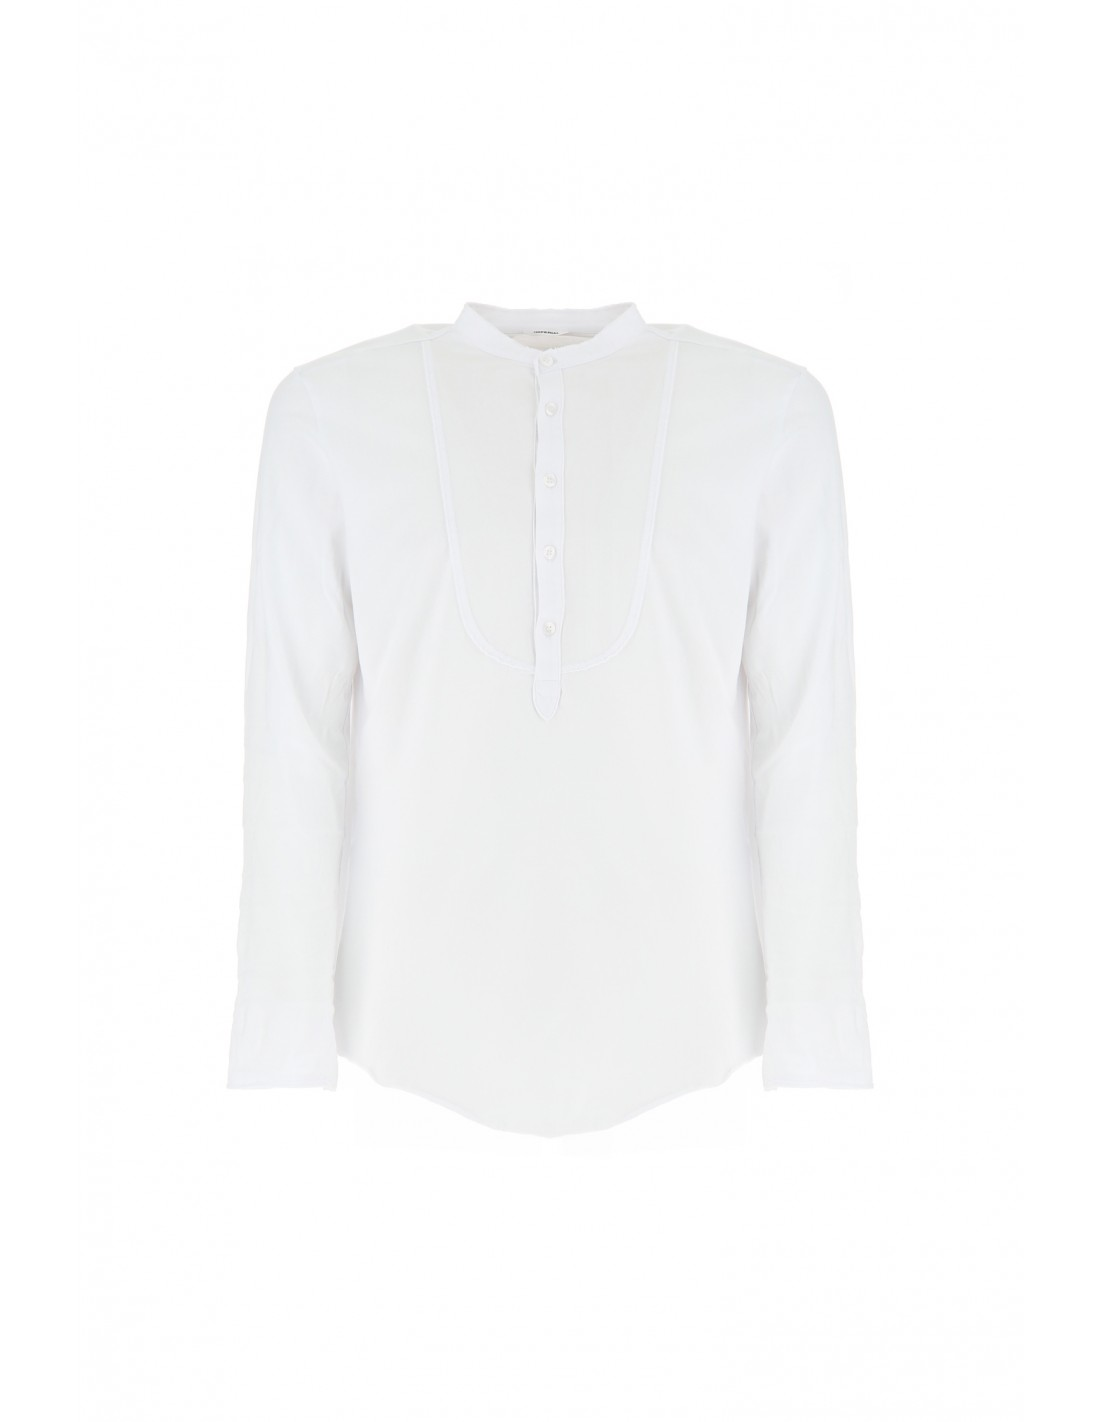 c603be57 tee-shirt-imperial-col-officier-coloris-blanc.jpg